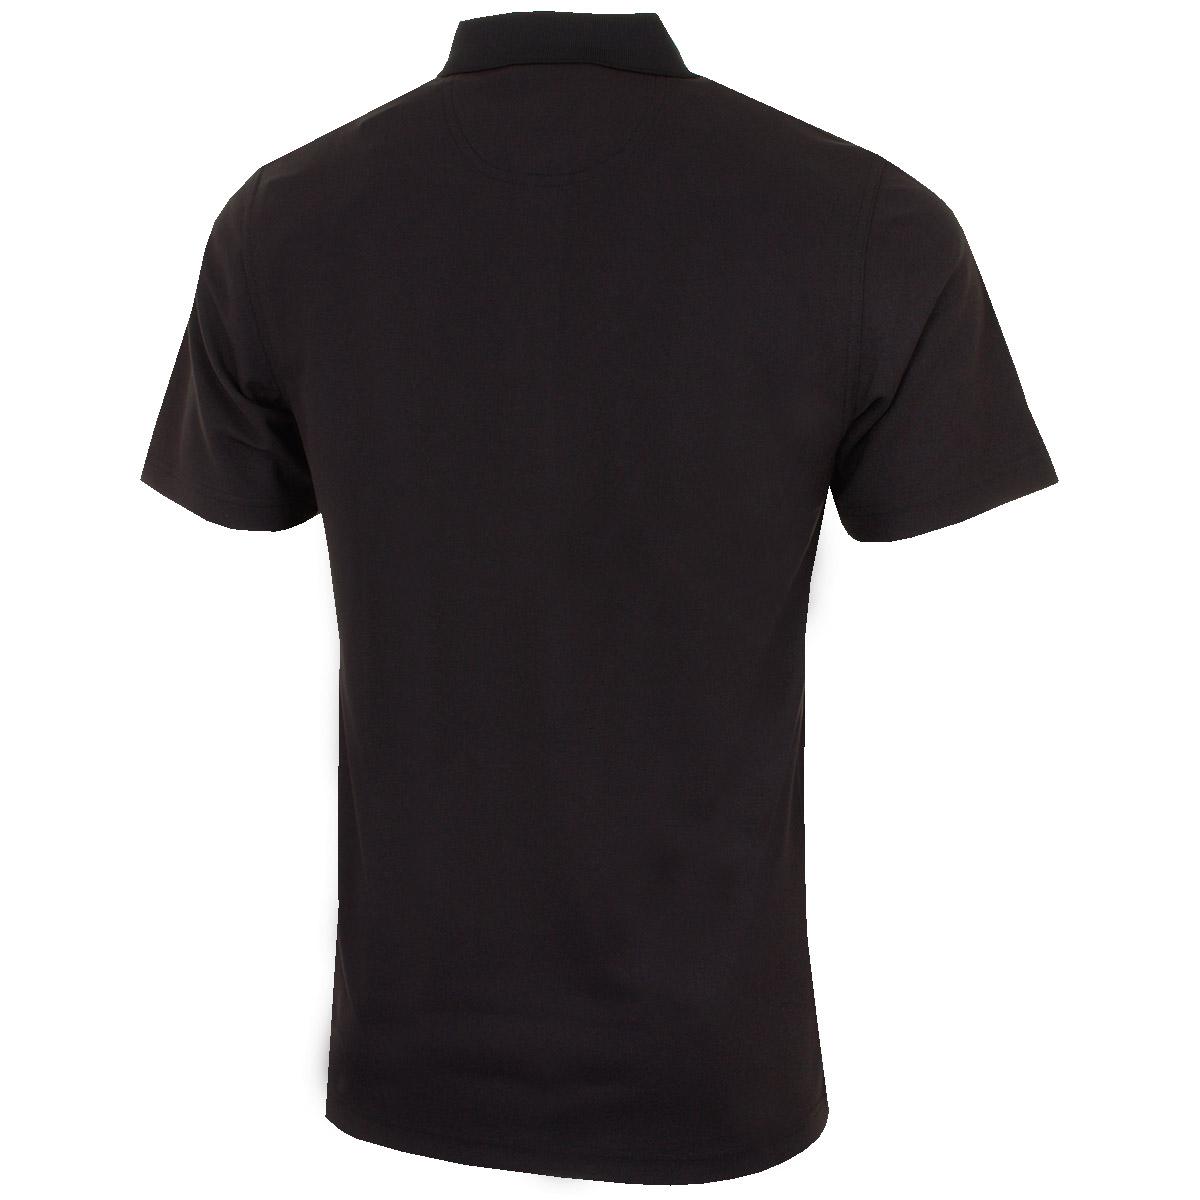 Greg-Norman-Mens-KX04-Performance-Micro-Pique-Golf-Polo-Shirt-28-OFF-RRP thumbnail 11